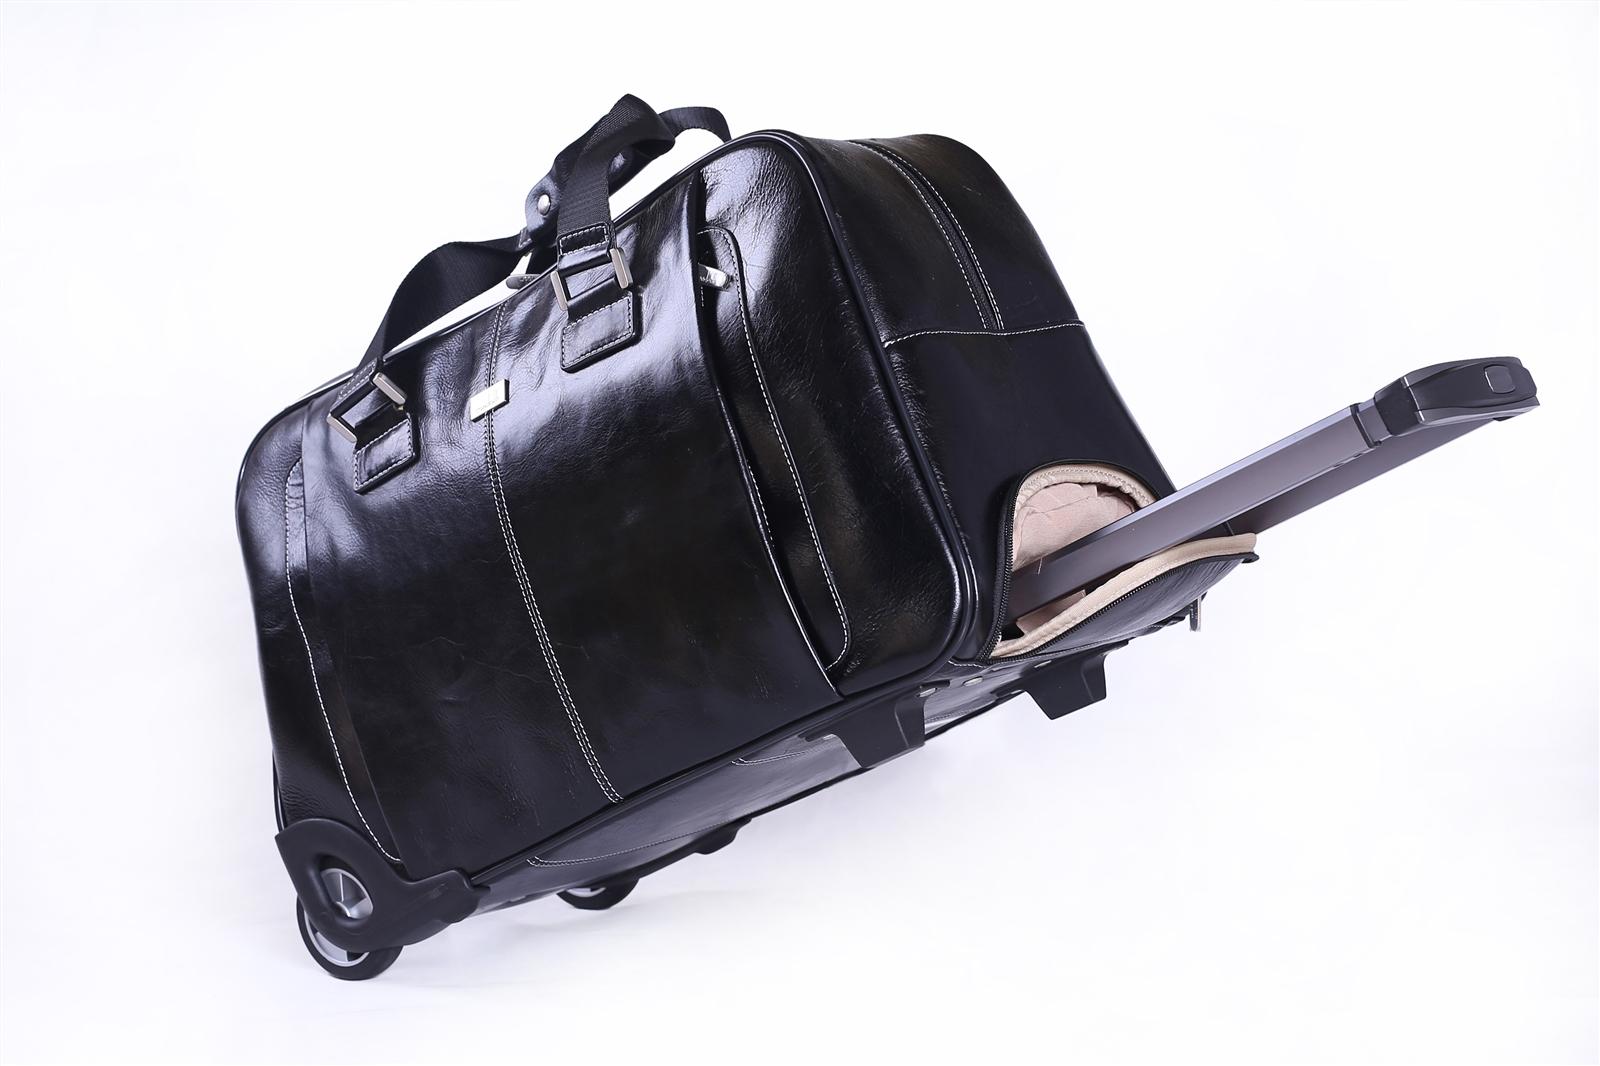 Leather Trolley Case/ 2Wheels - CODE 146-1747